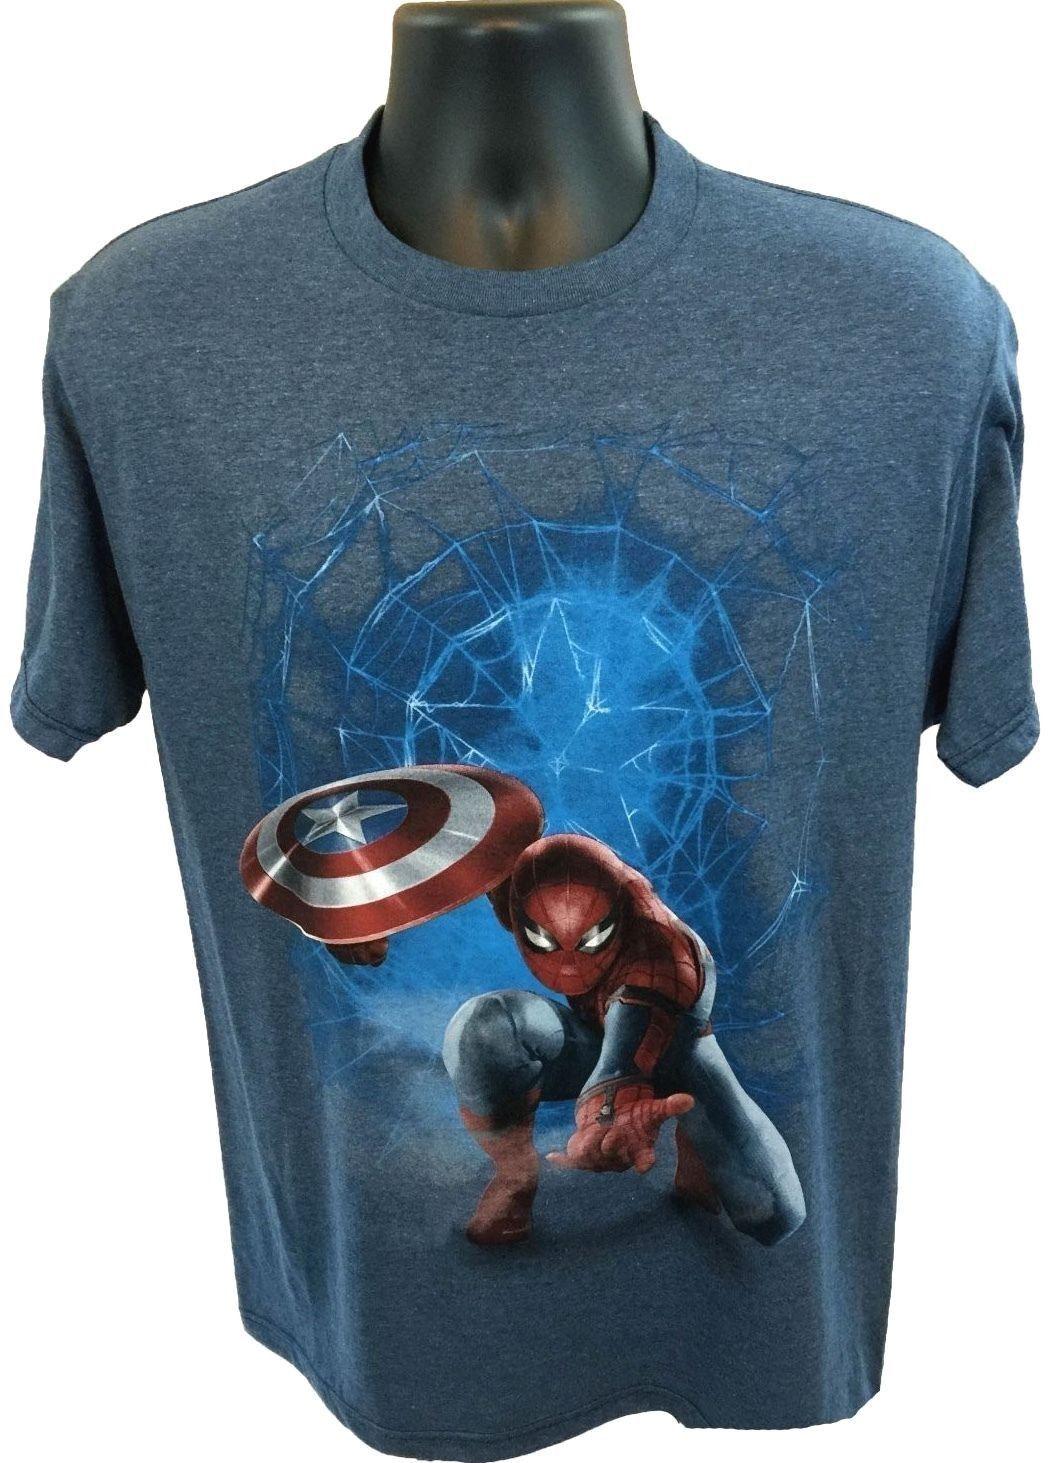 3d32cac7 New MARVEL SPIDERMAN Civil War Mens T-Shirt Size Medium - Visit to grab an  amazing super hero shirt now on sale!